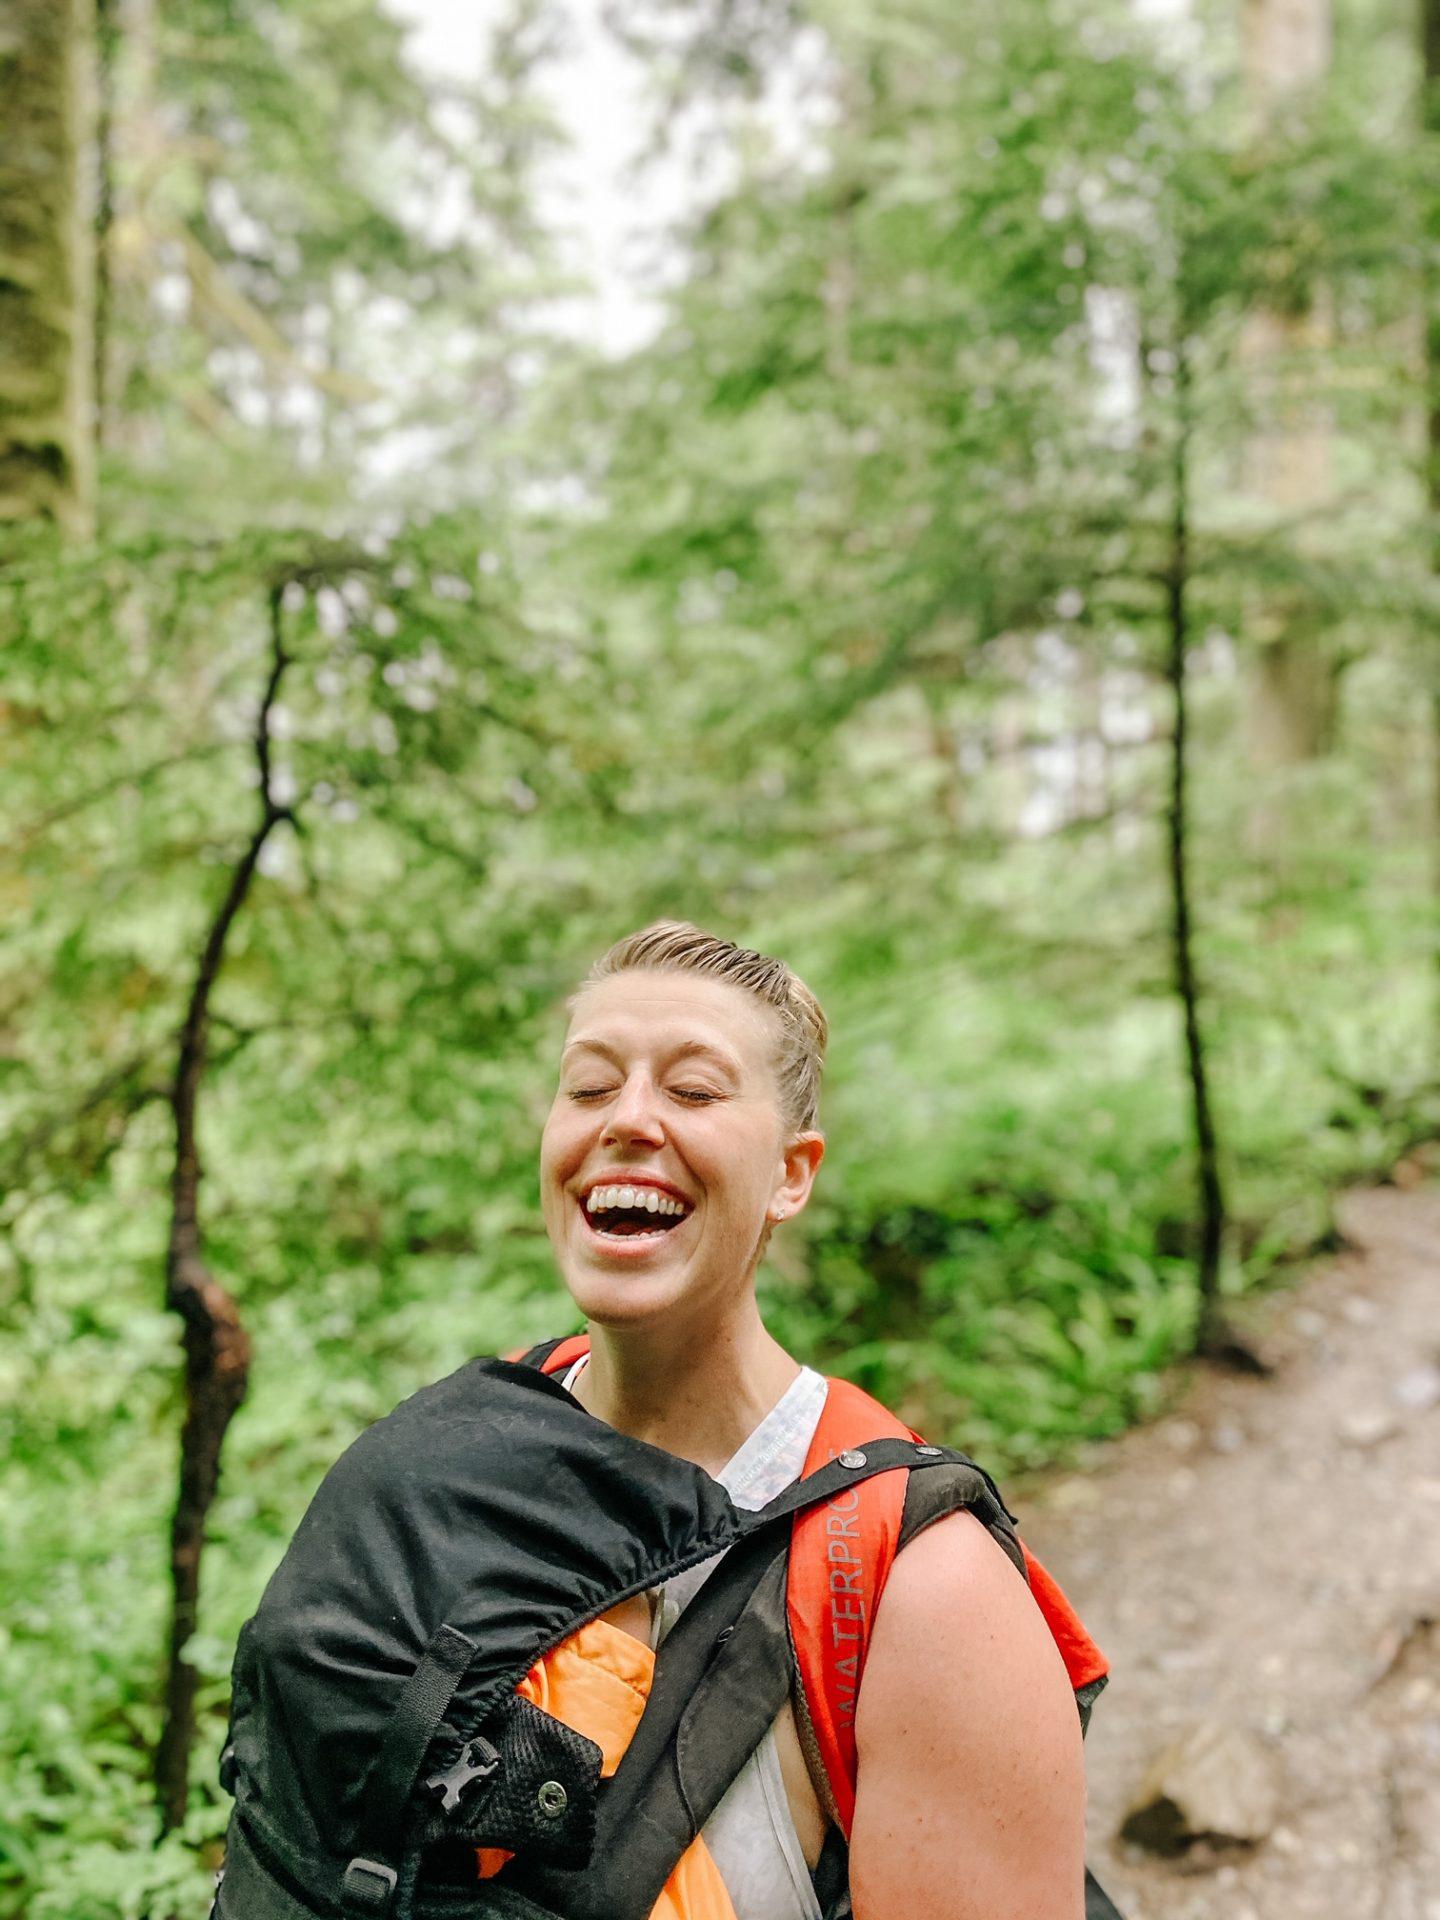 hiking vibes